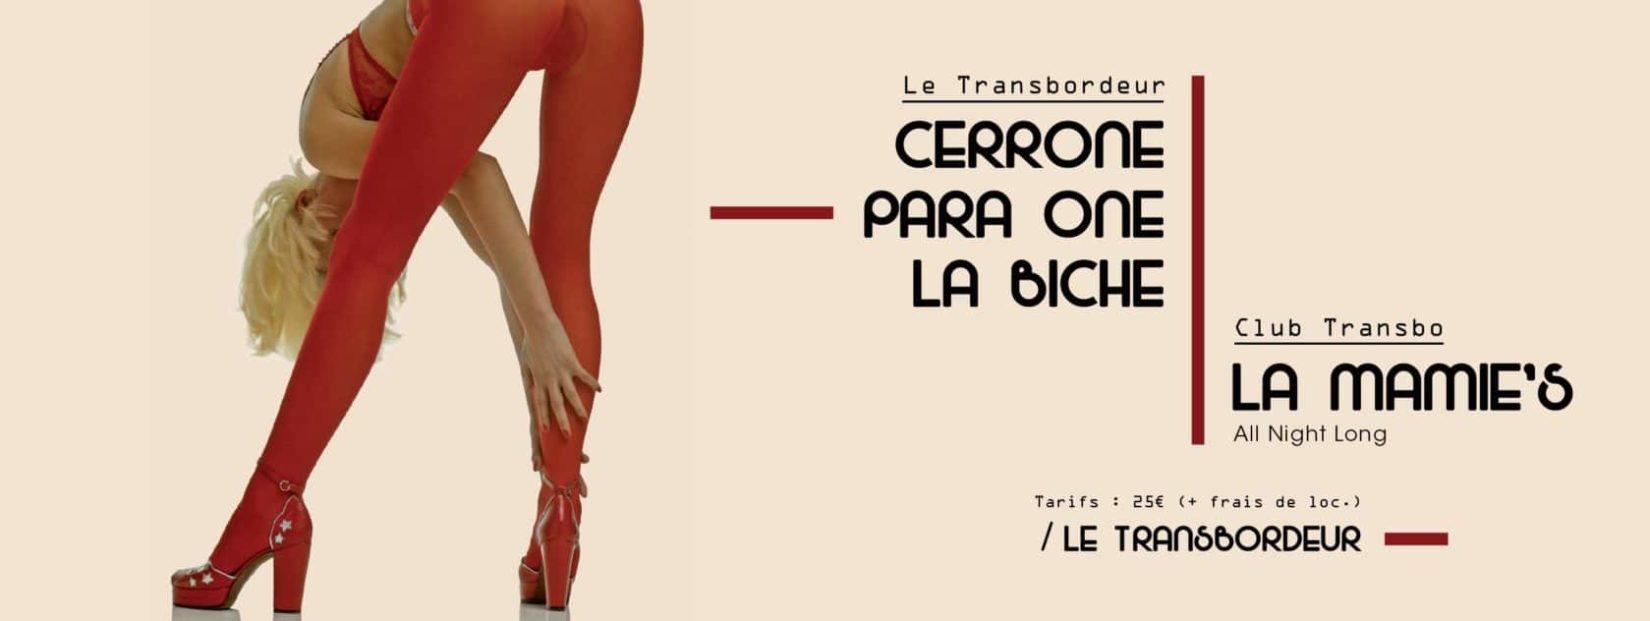 cover concert para one cerrone